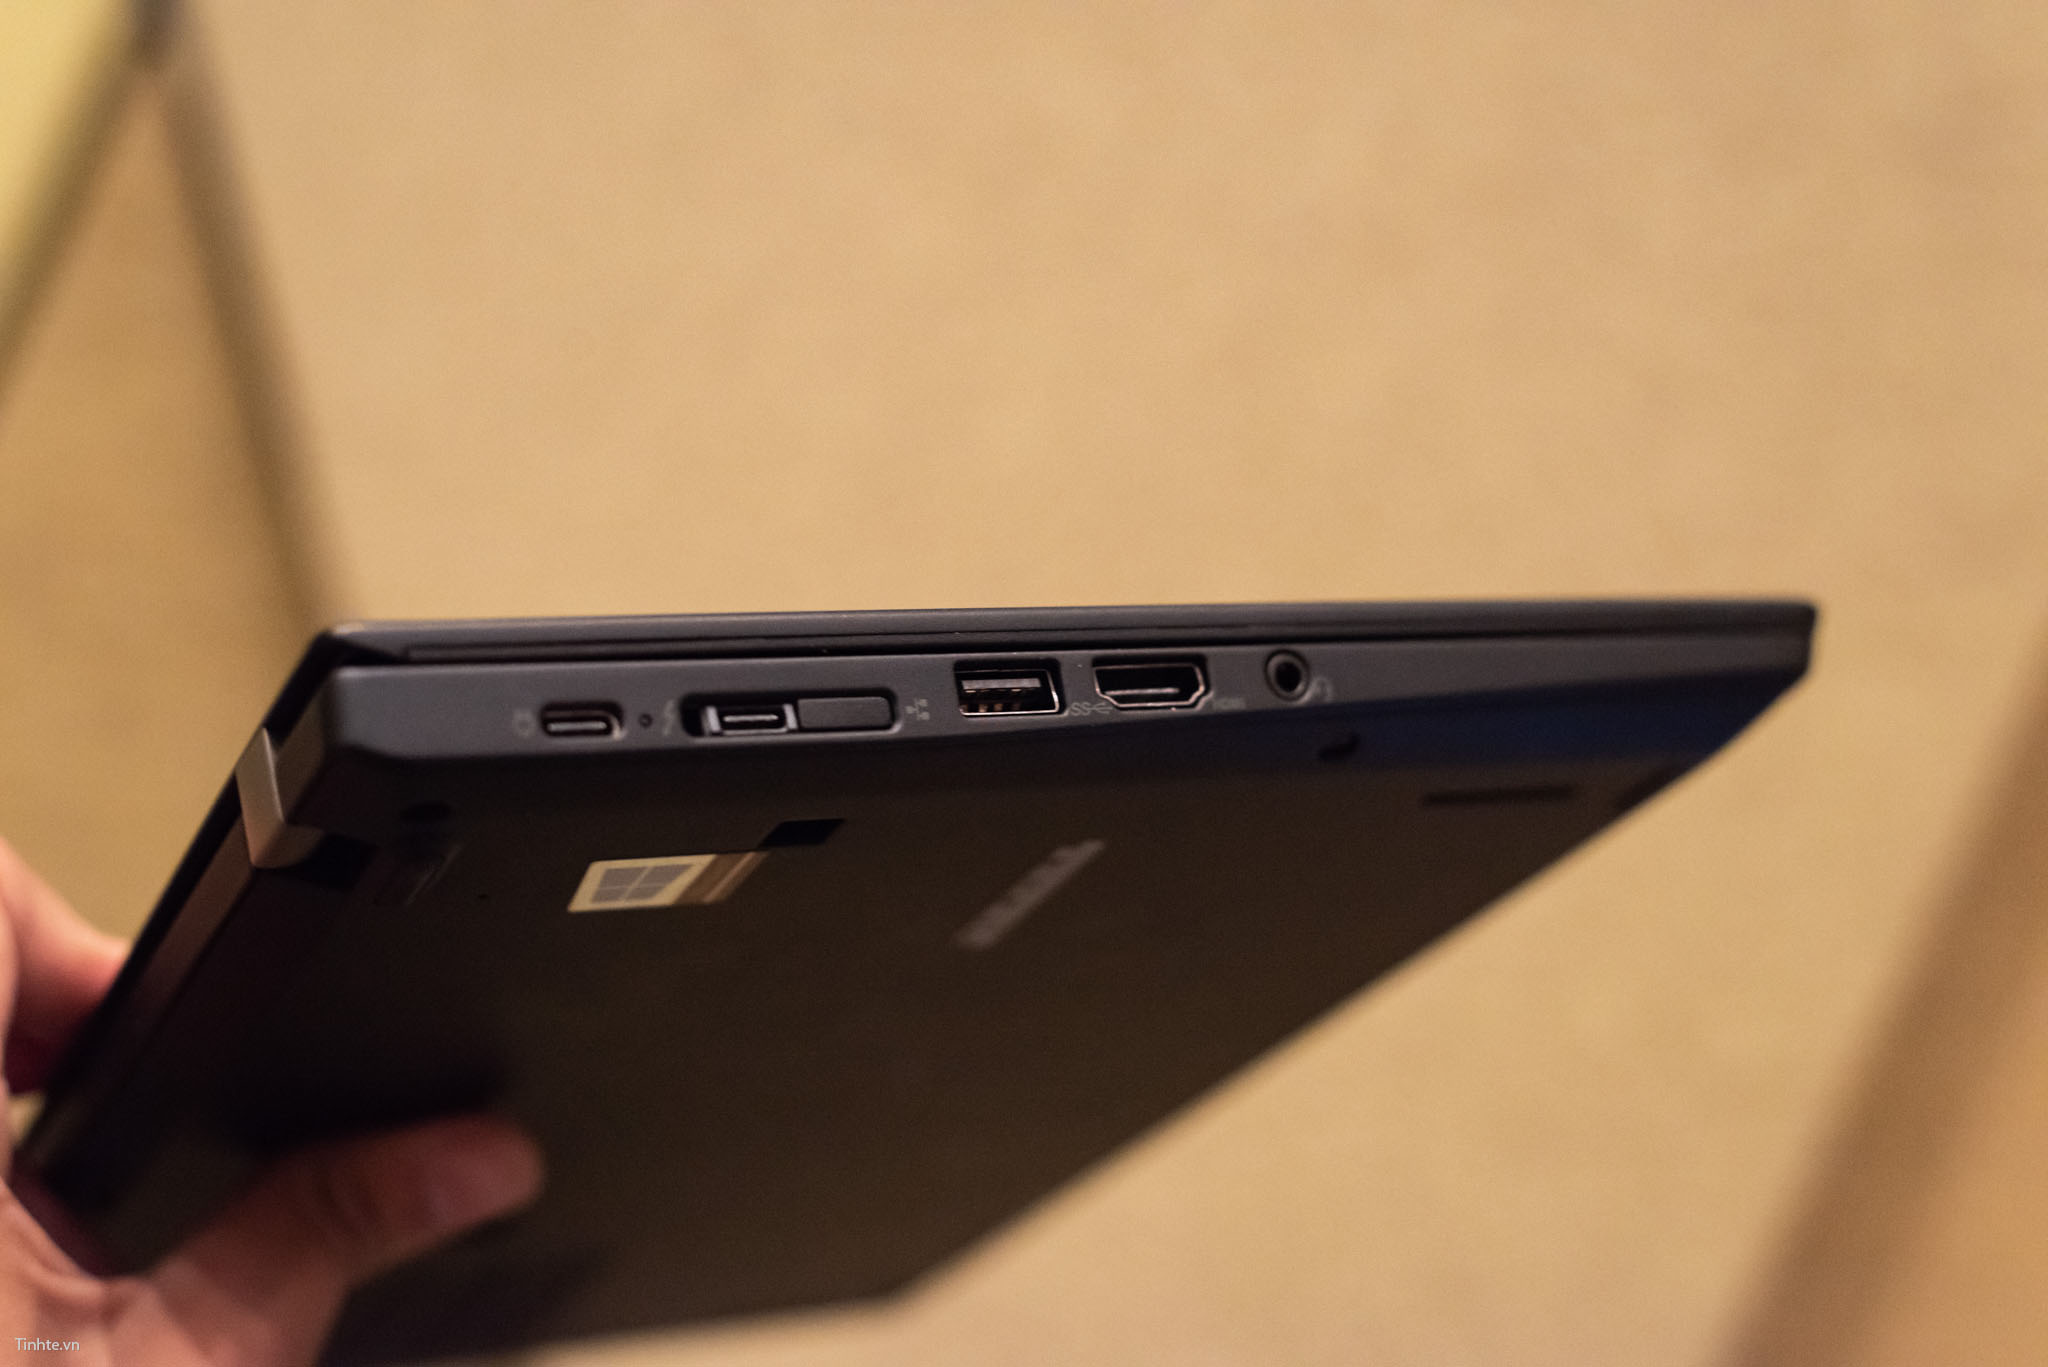 Tinhte.vn_Lenovo_ThinkPad_2018-8.jpg